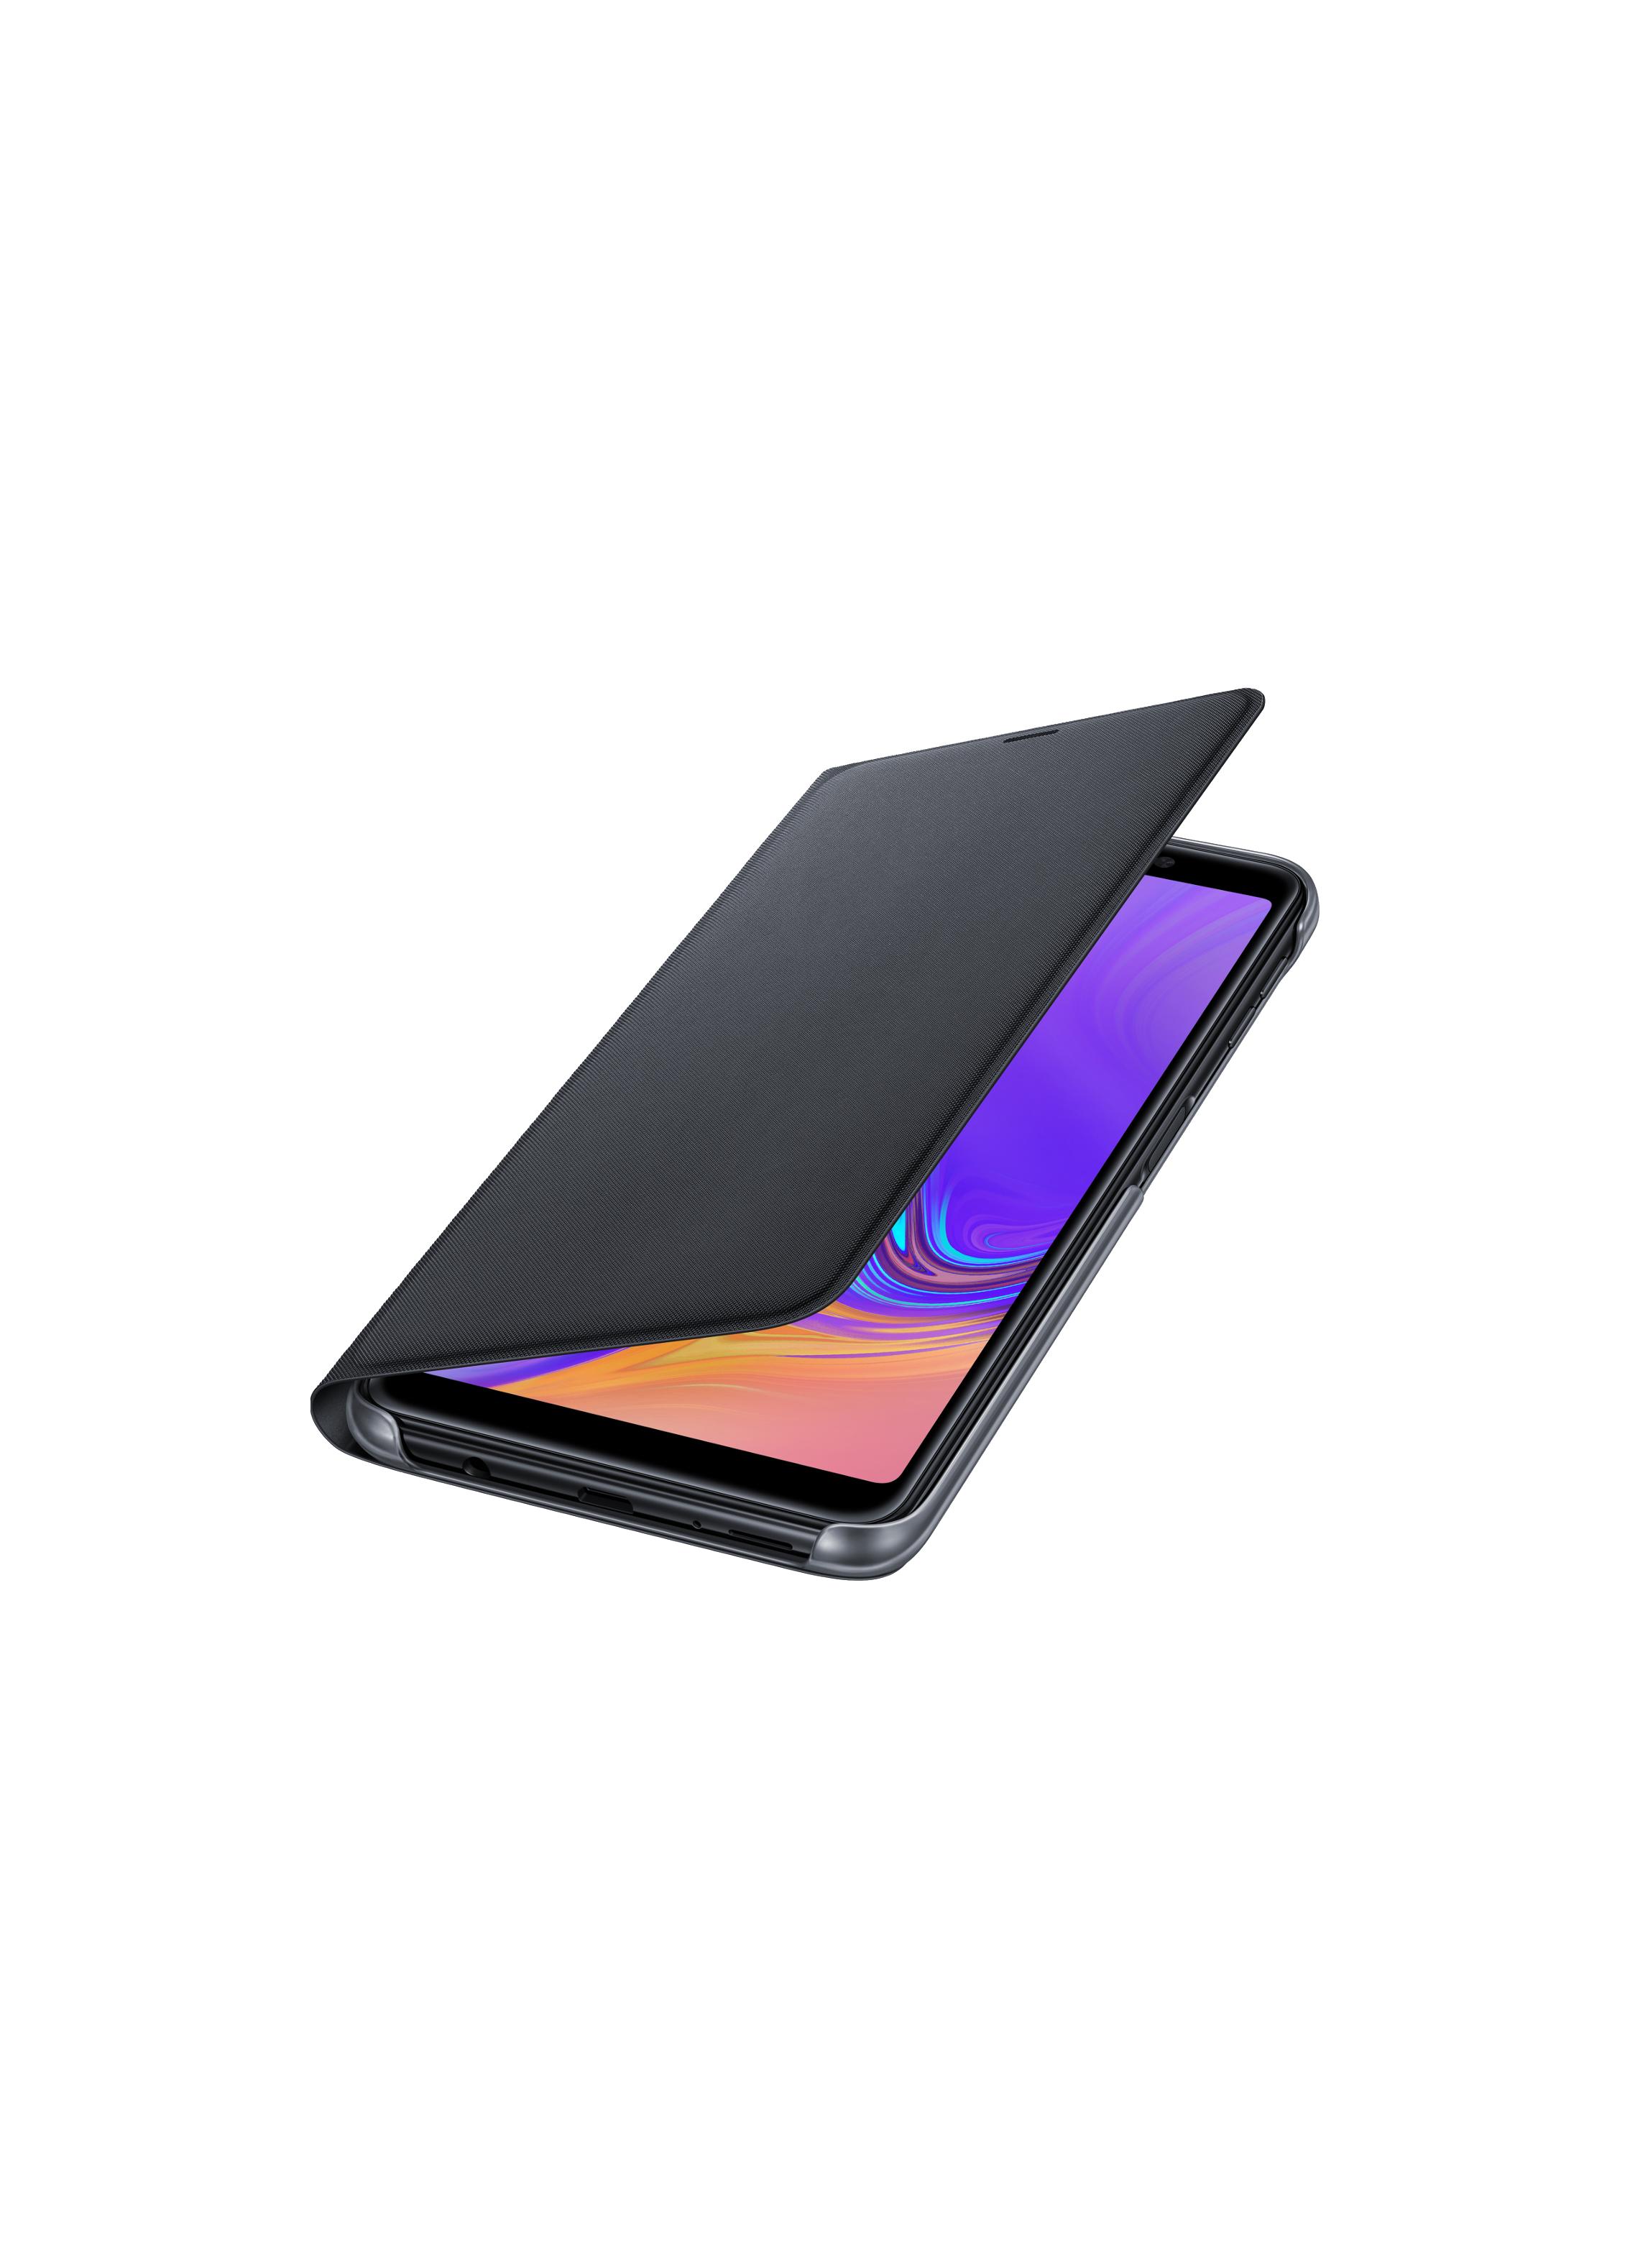 Etui folio Samsung Galaxy J6 Plus noir